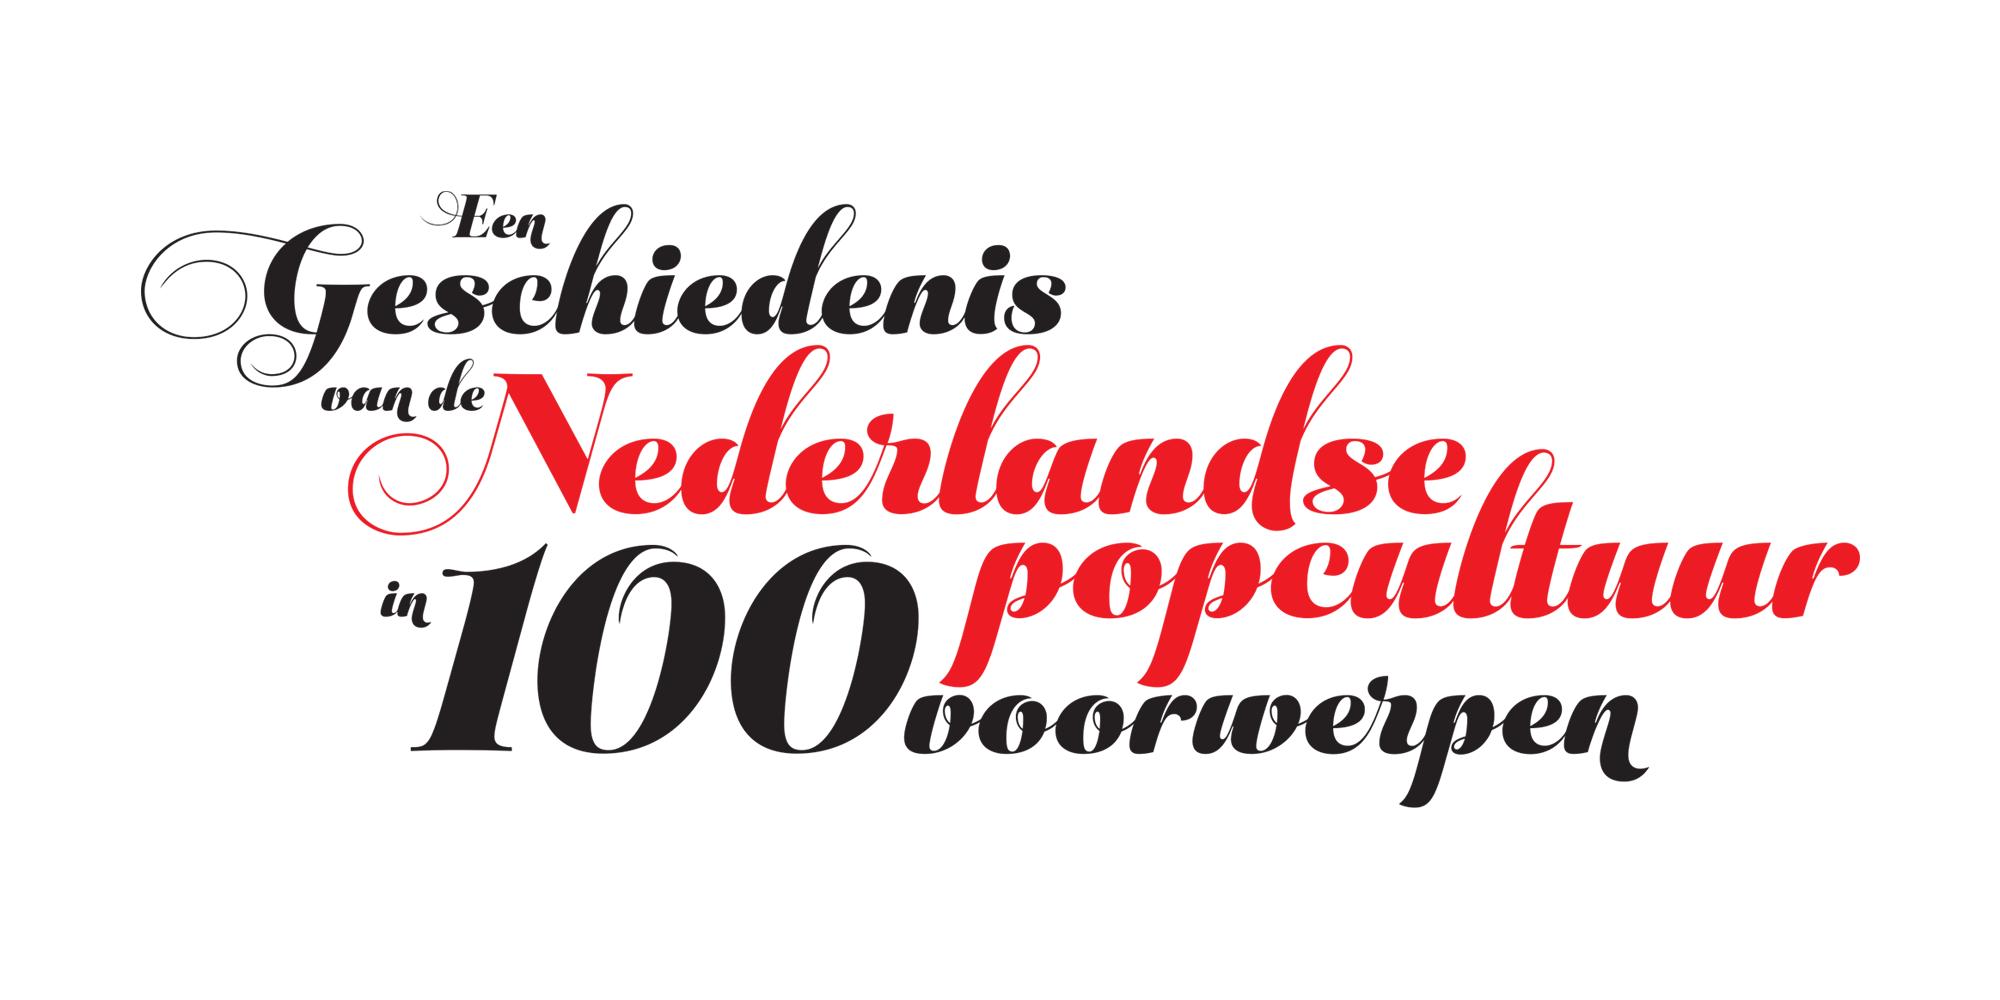 http://www.volkskrant.nl/kijkverder/2017/popcanon/img/thumb.png